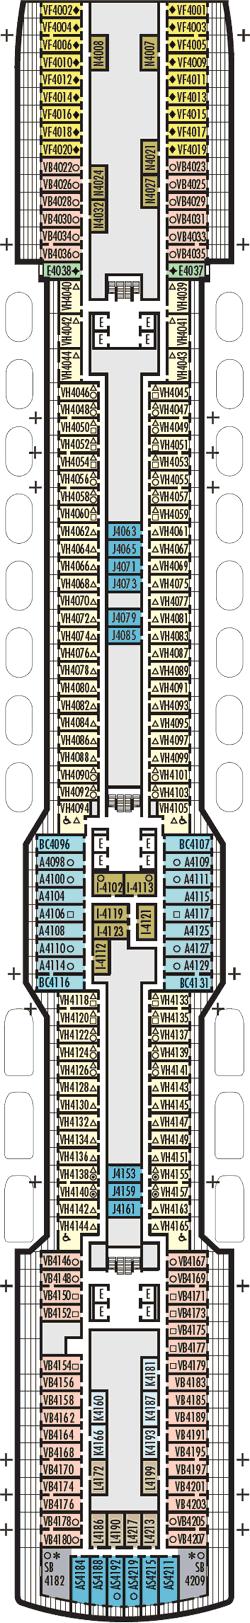 Rotterdam Beethoven Deck Deck Plan